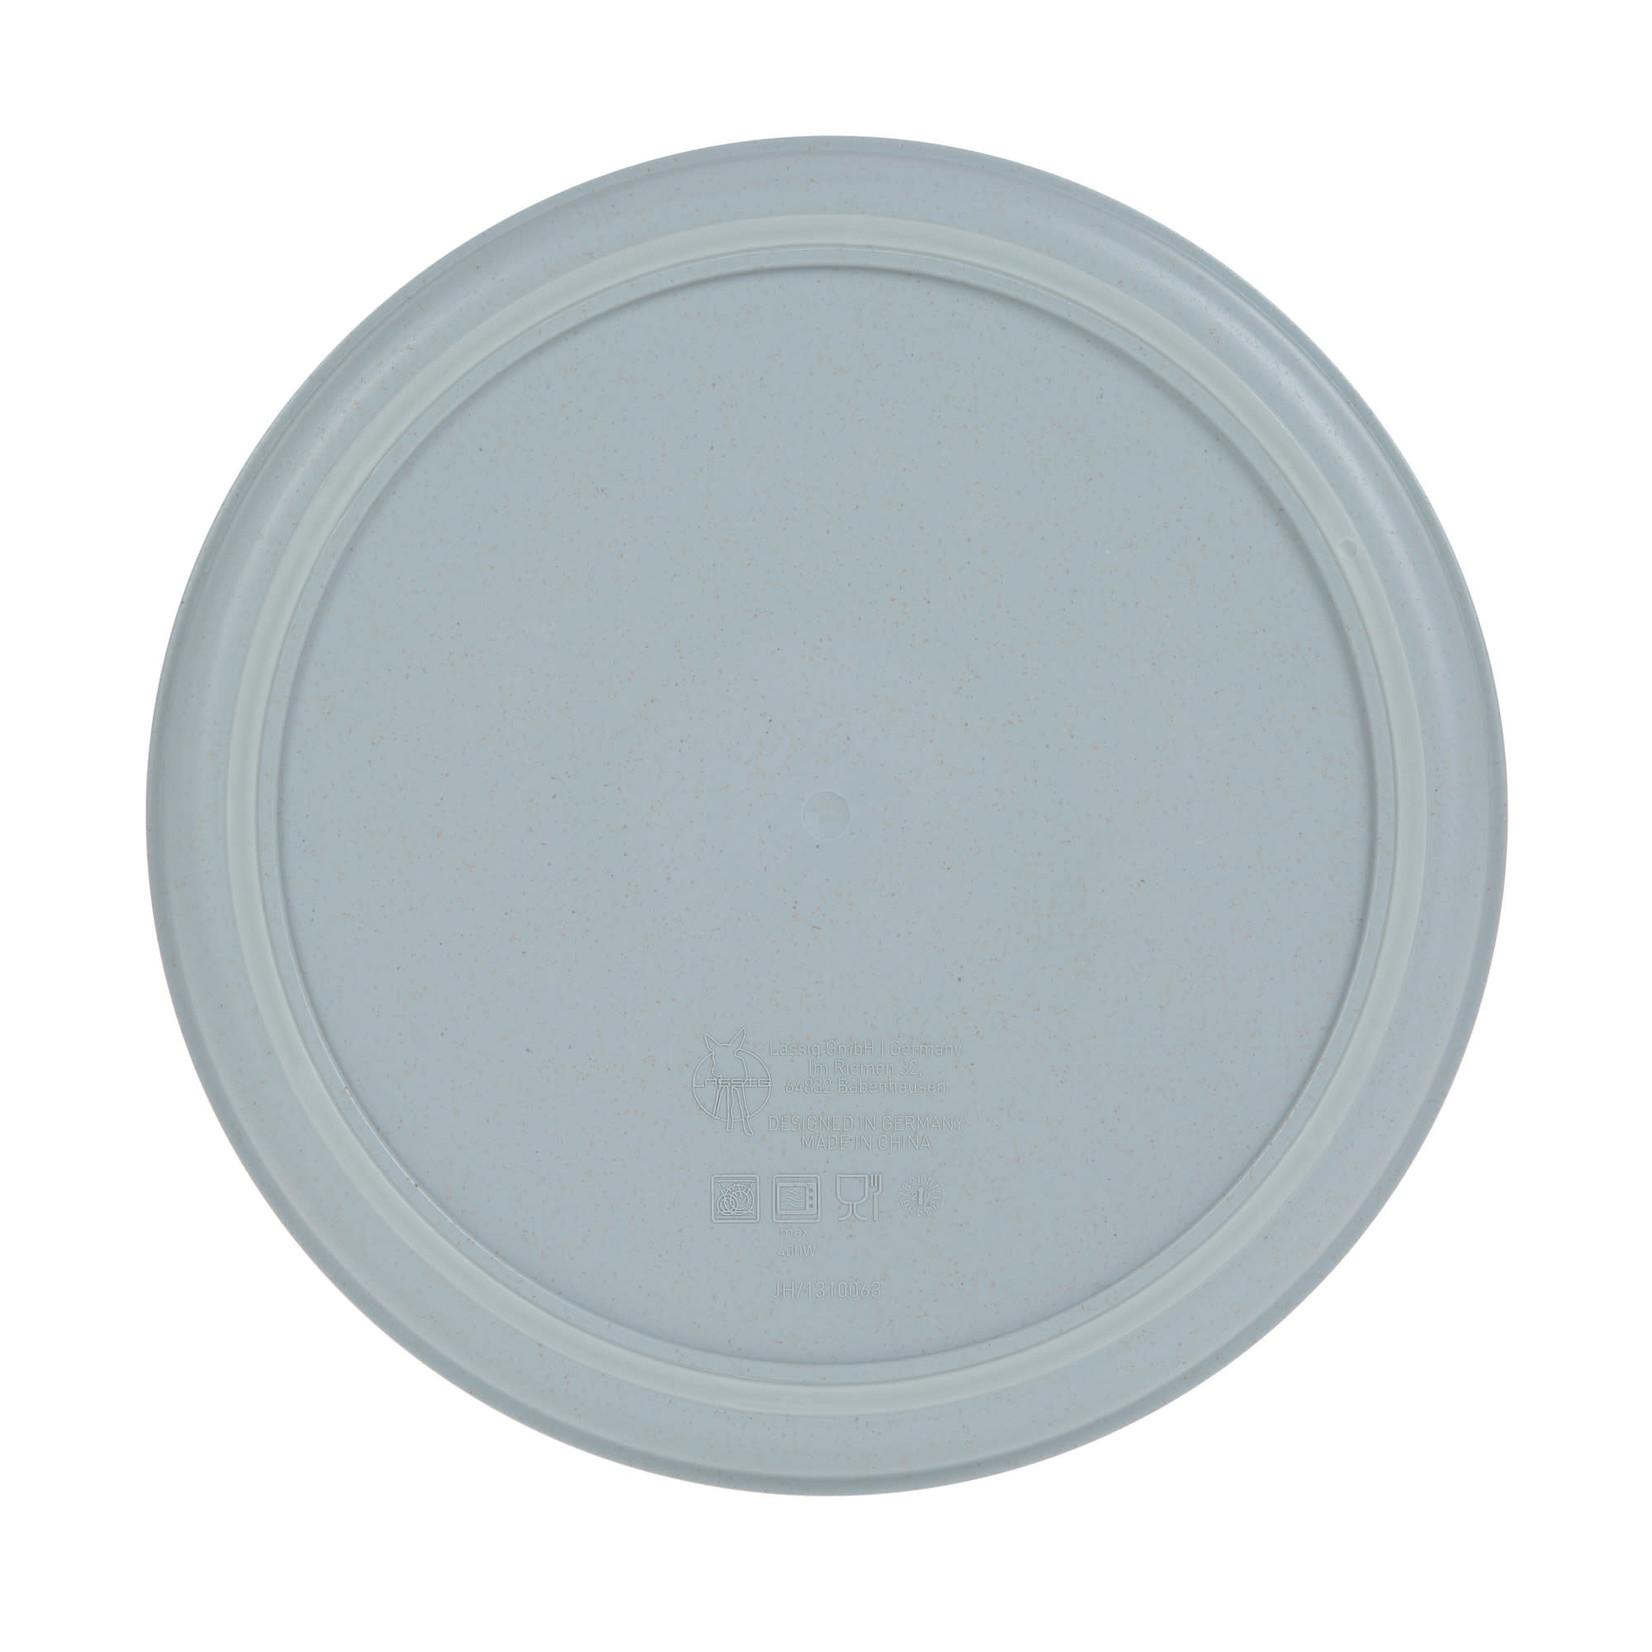 Lässig Plate P/Cellulose Tiny Farmer Sheep/Goose Blue